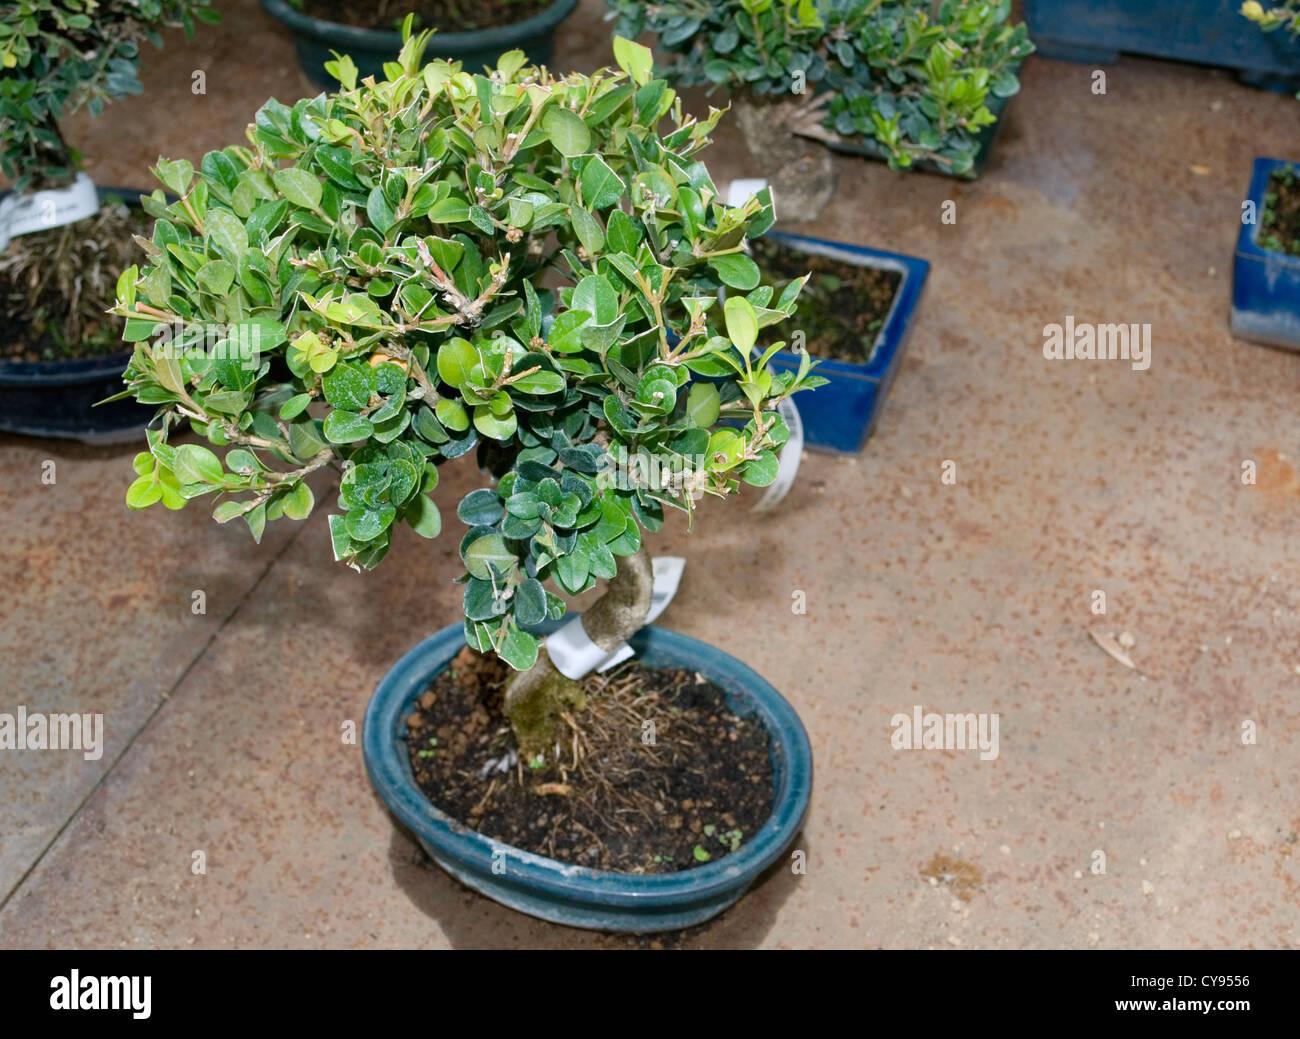 Buxus Sempervirens Bonsai Tree Stock Photo Alamy